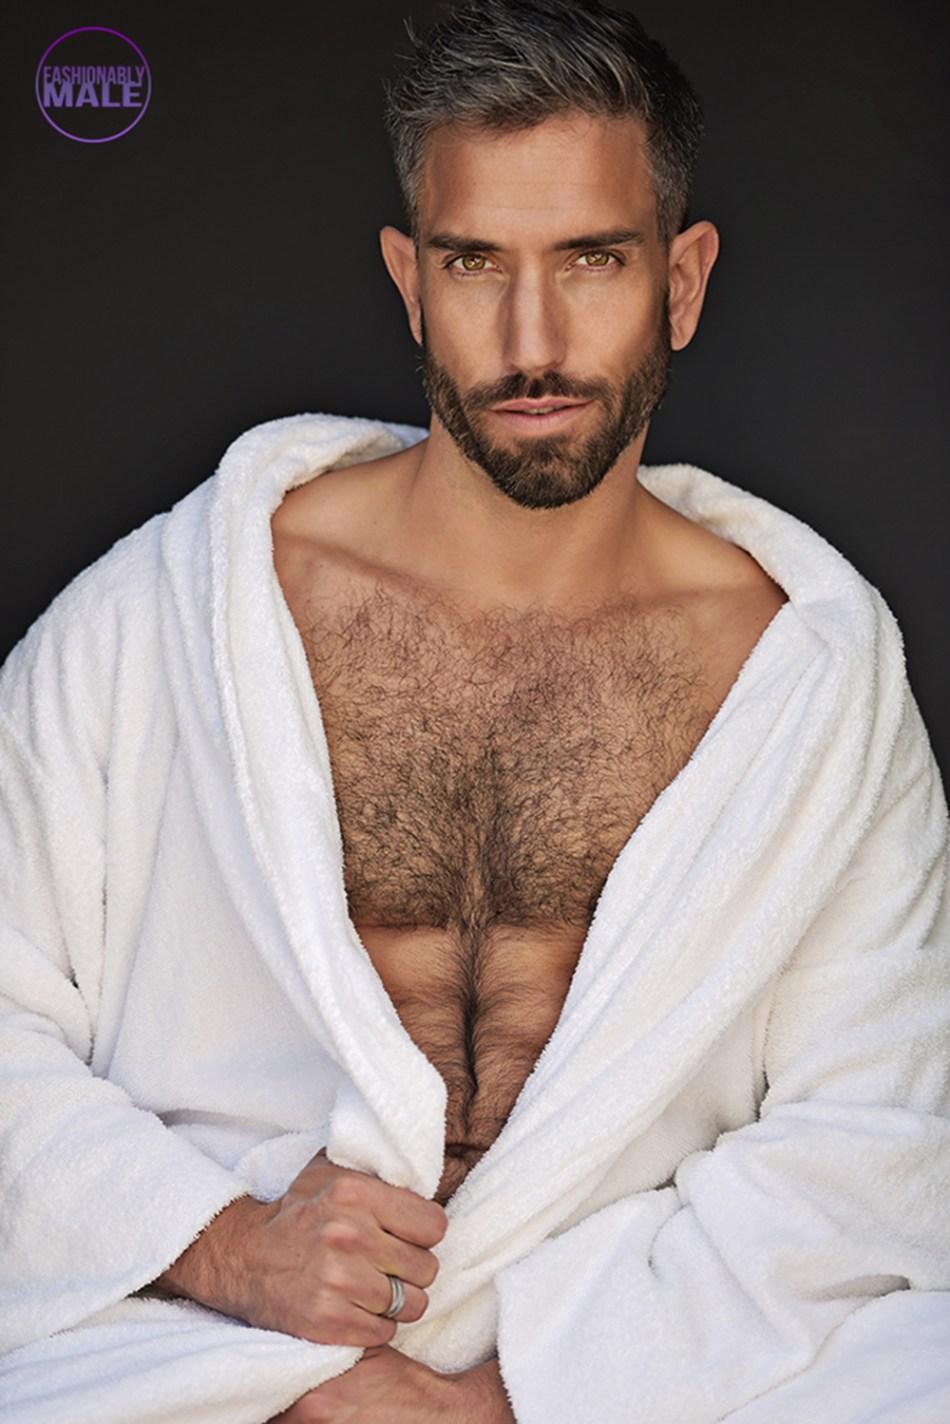 Stephane Marti by Shotsbygun for Fashionably Male8